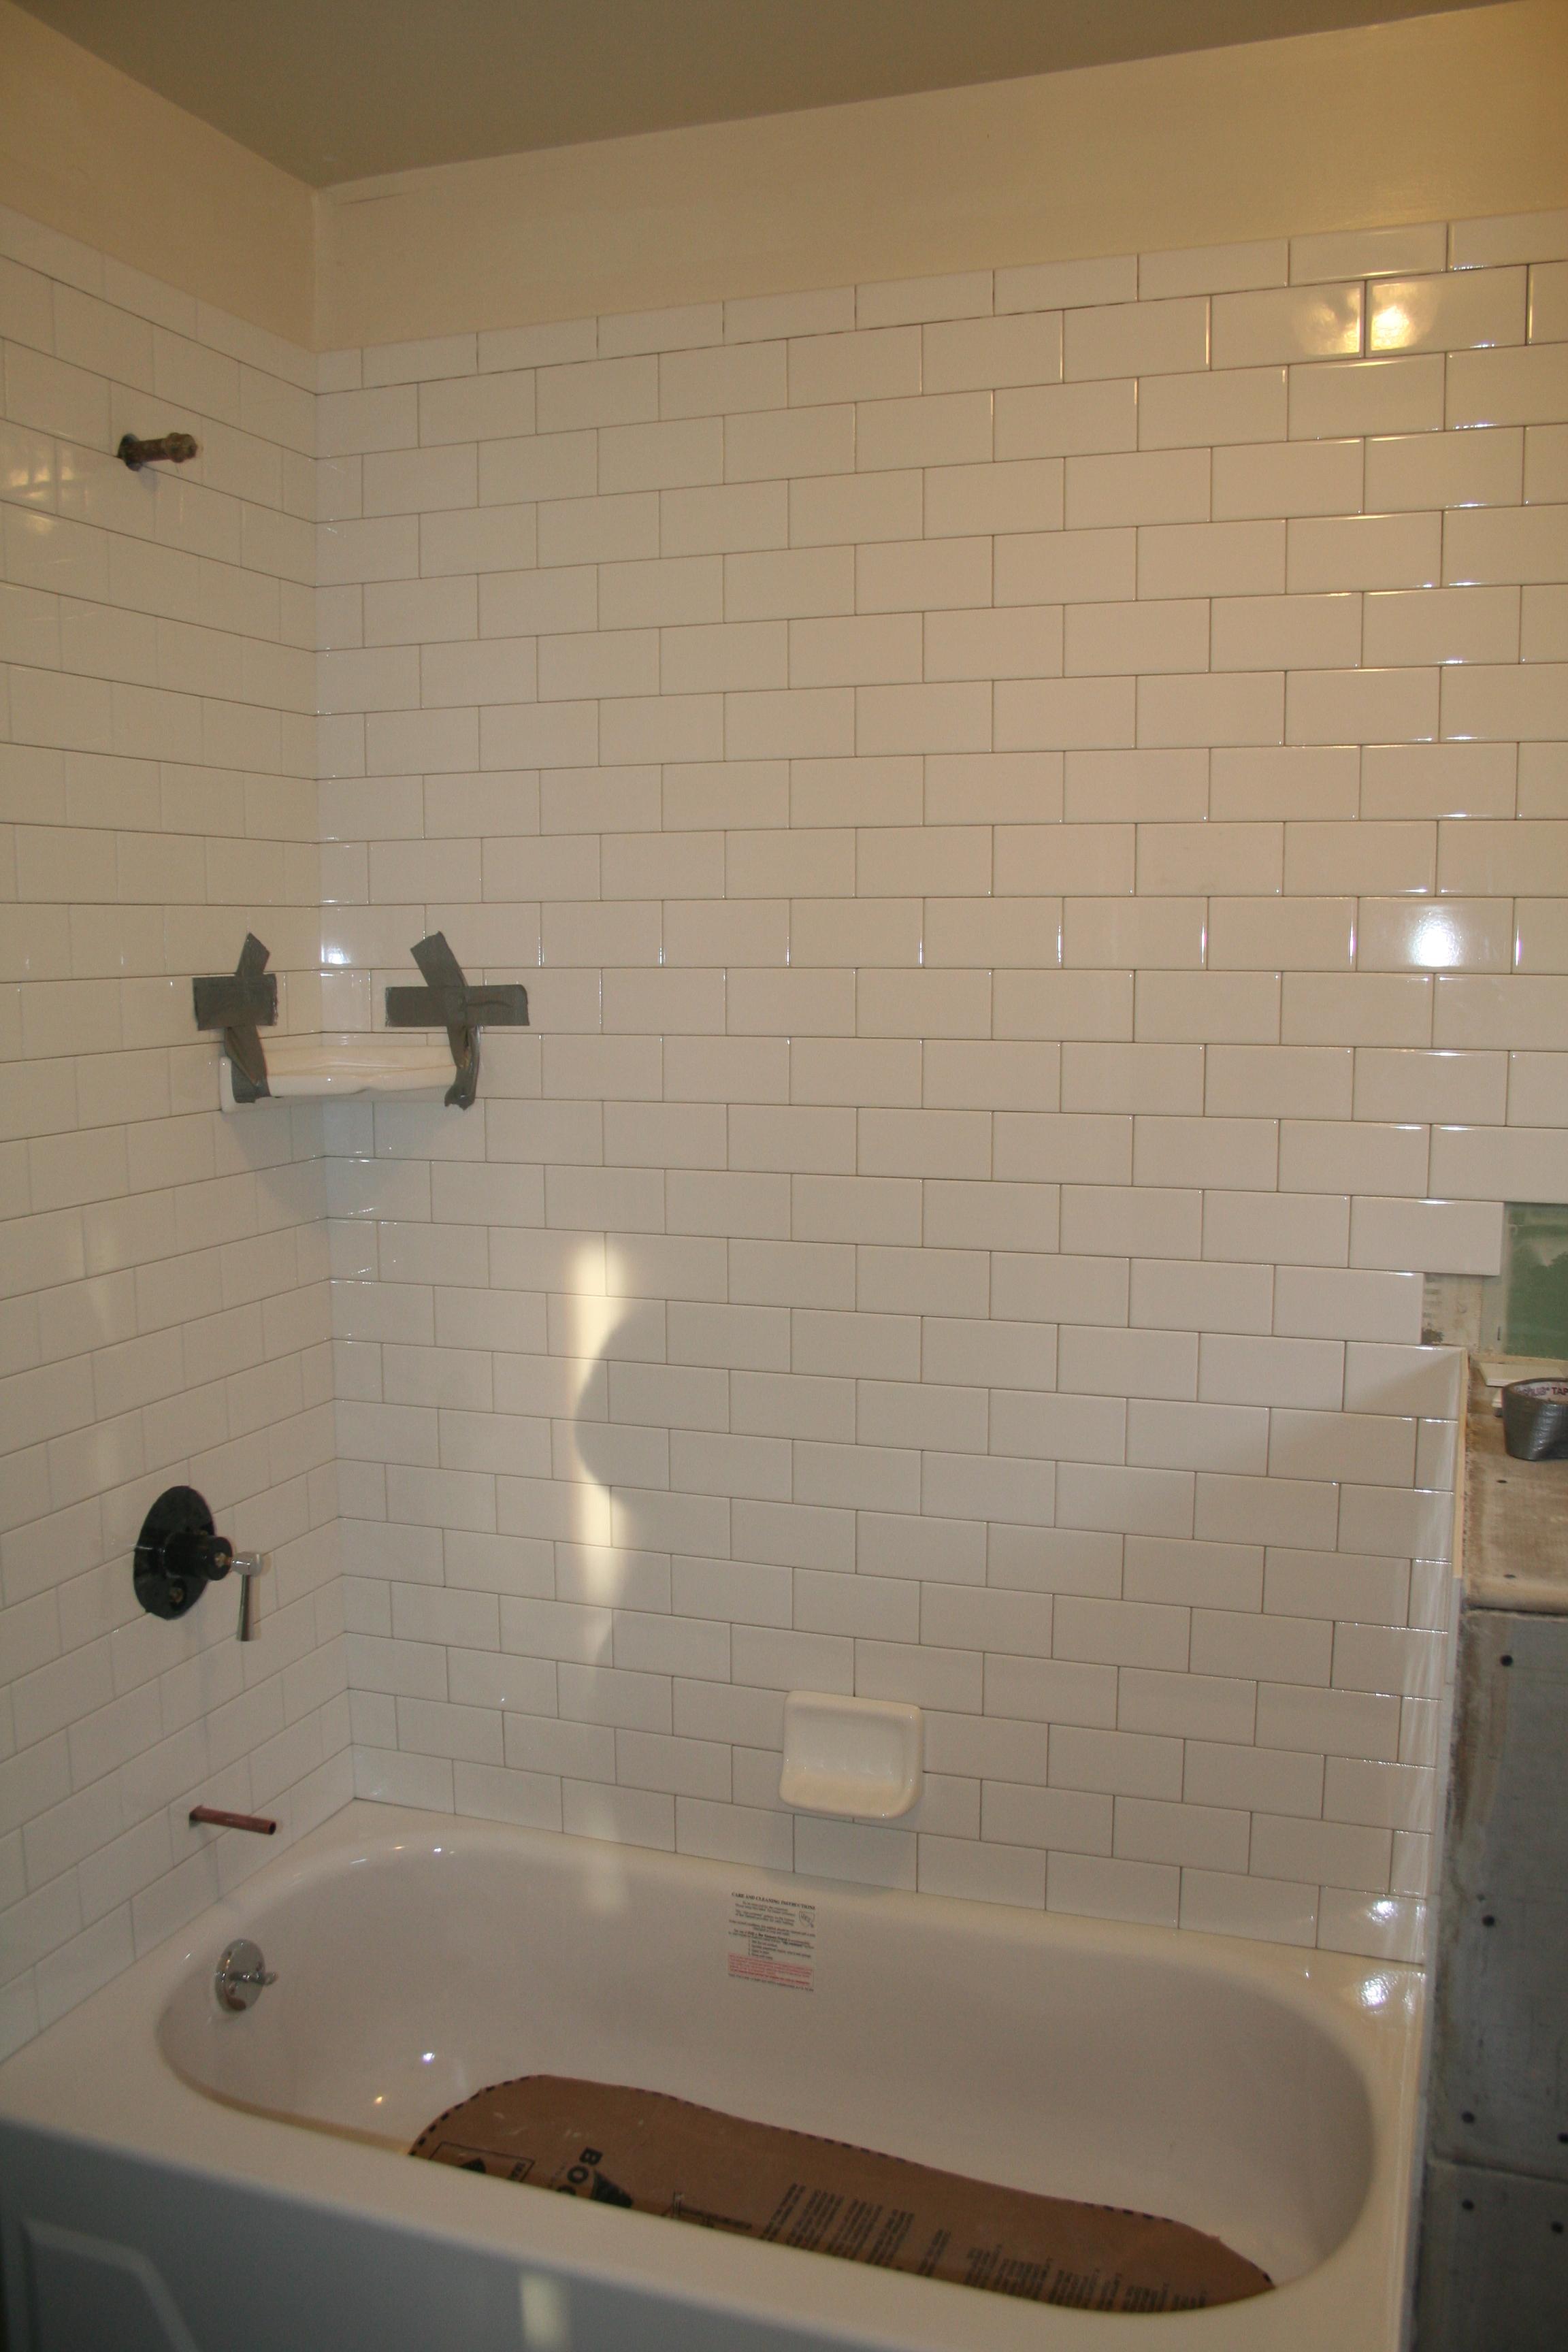 Shower Tub Combo Ideas - Buzzle Web Portal: Intelligent Life on